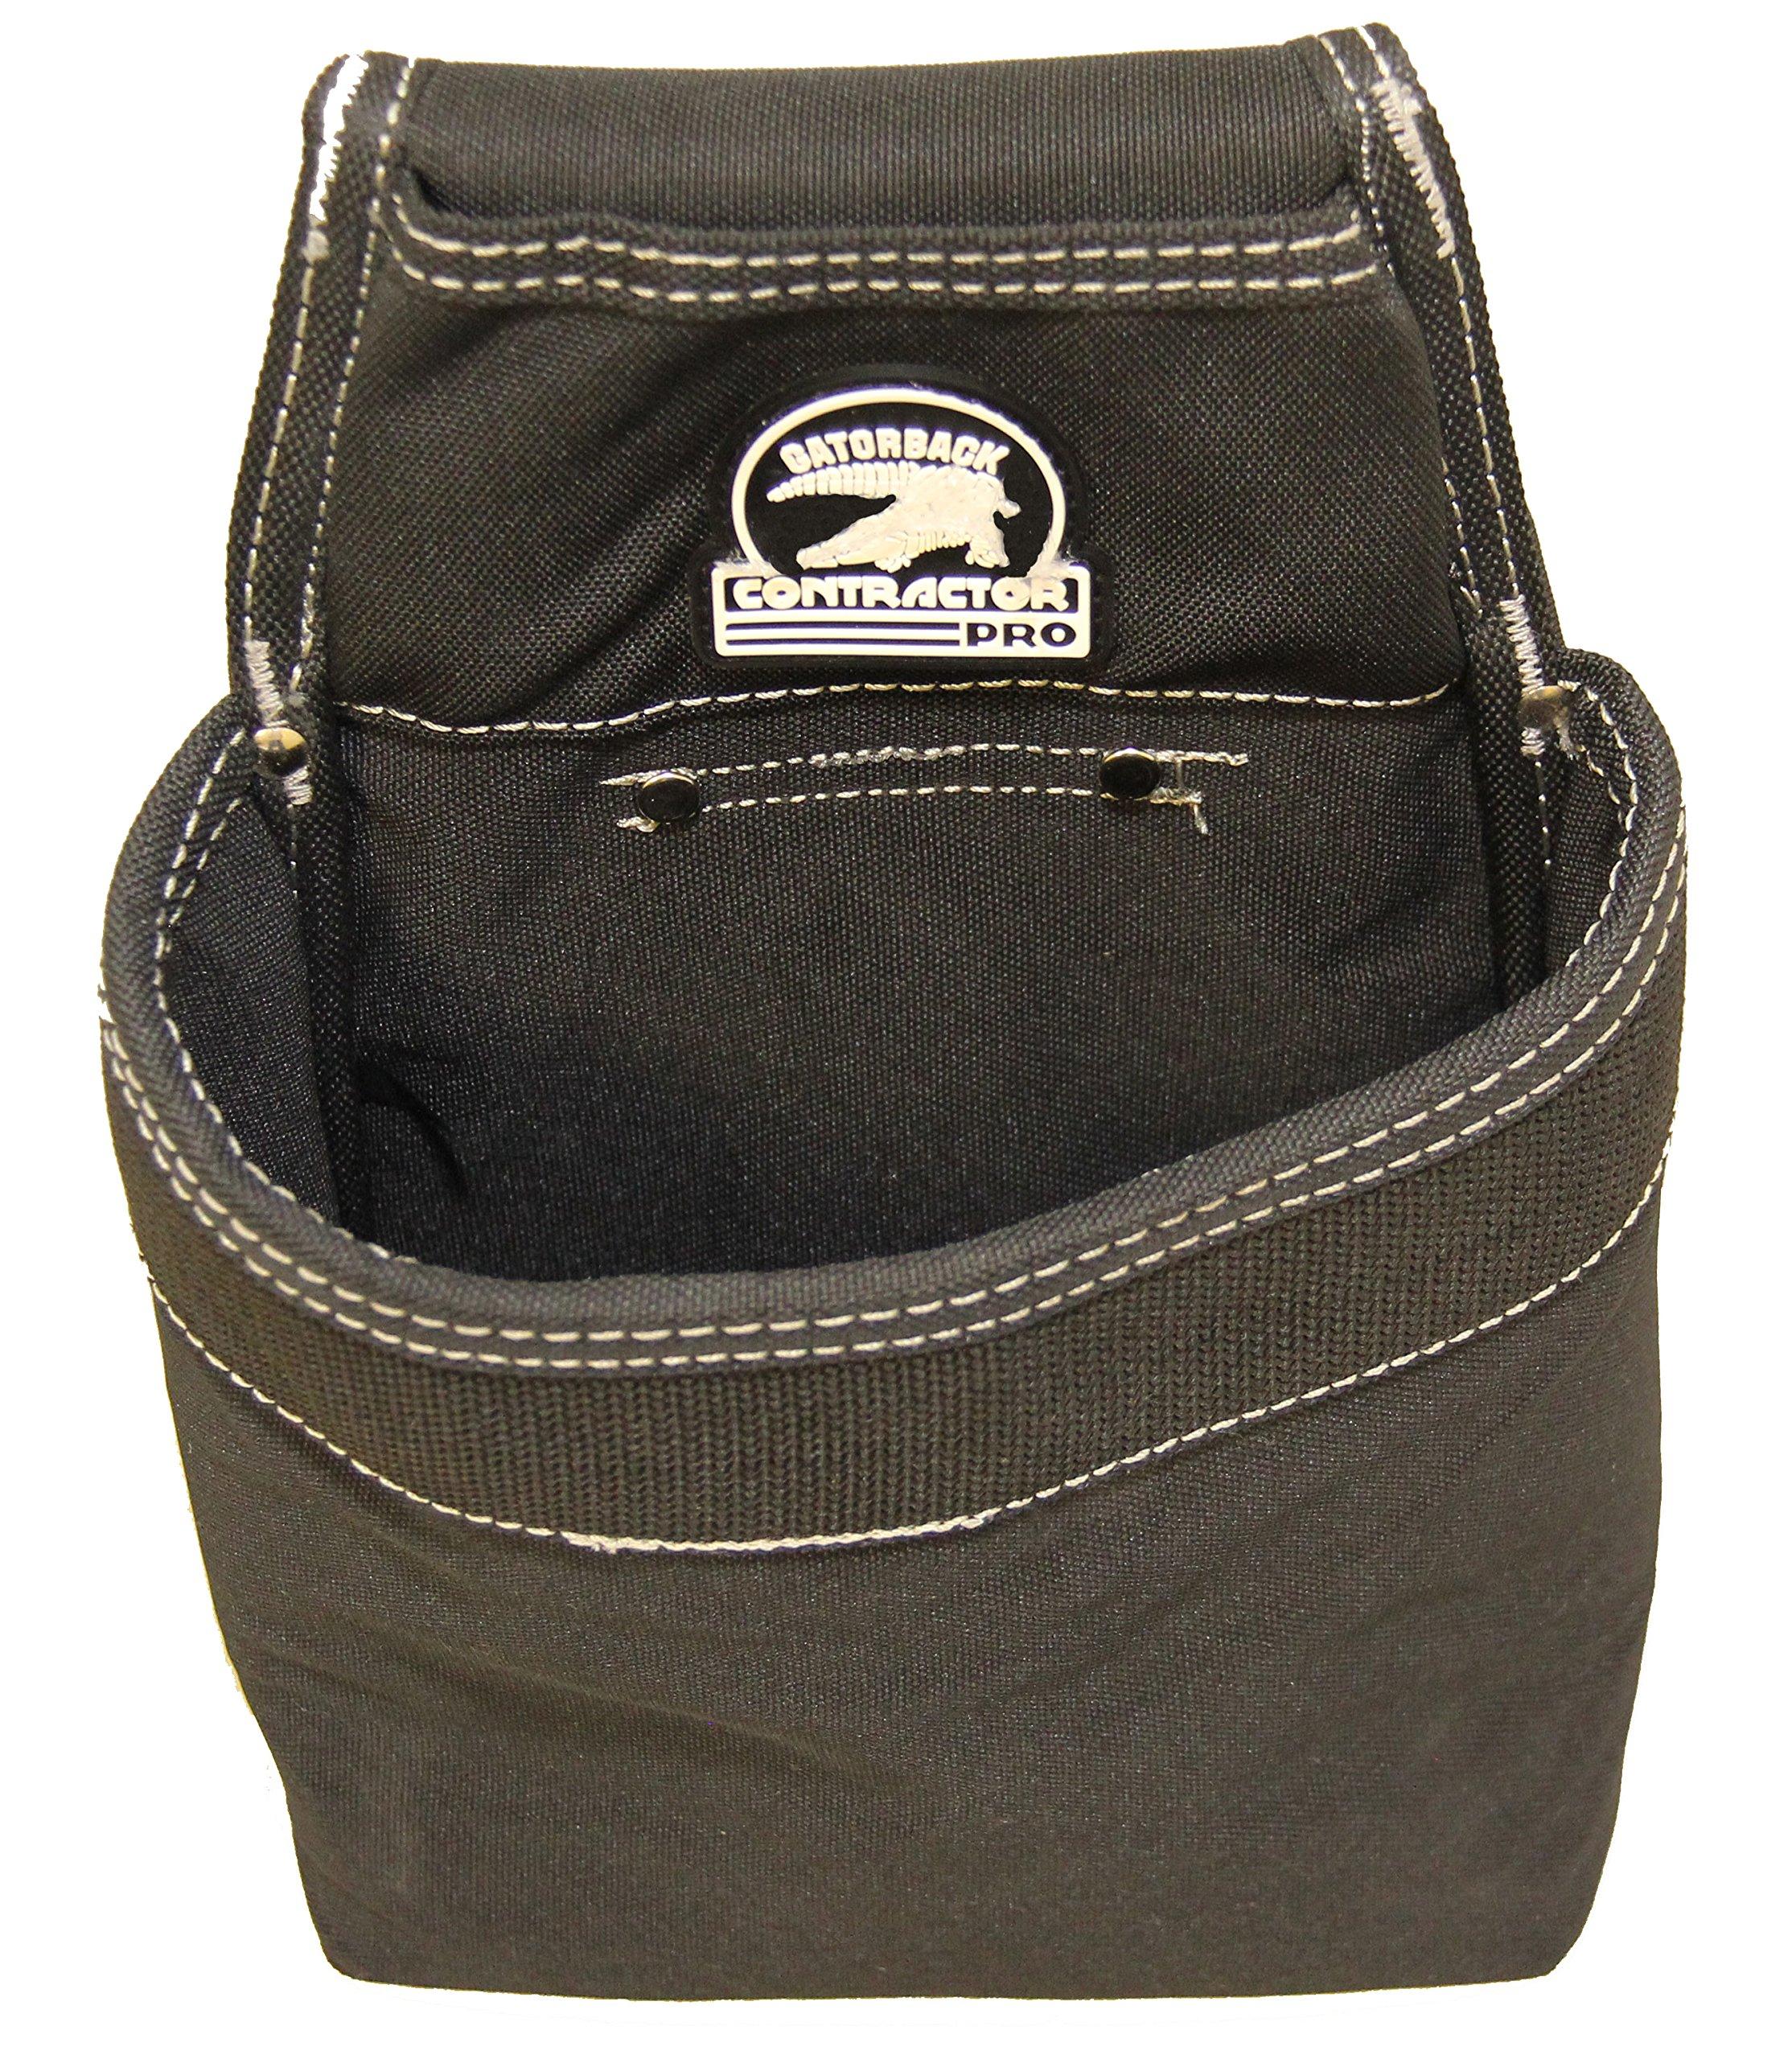 Gatorback B145 Carpenters Triple Combo w/Pro-Comfort Back Support Belt. Heavy Duty Work Belt (X-Large 40''-44'') by Gatorback (Image #5)